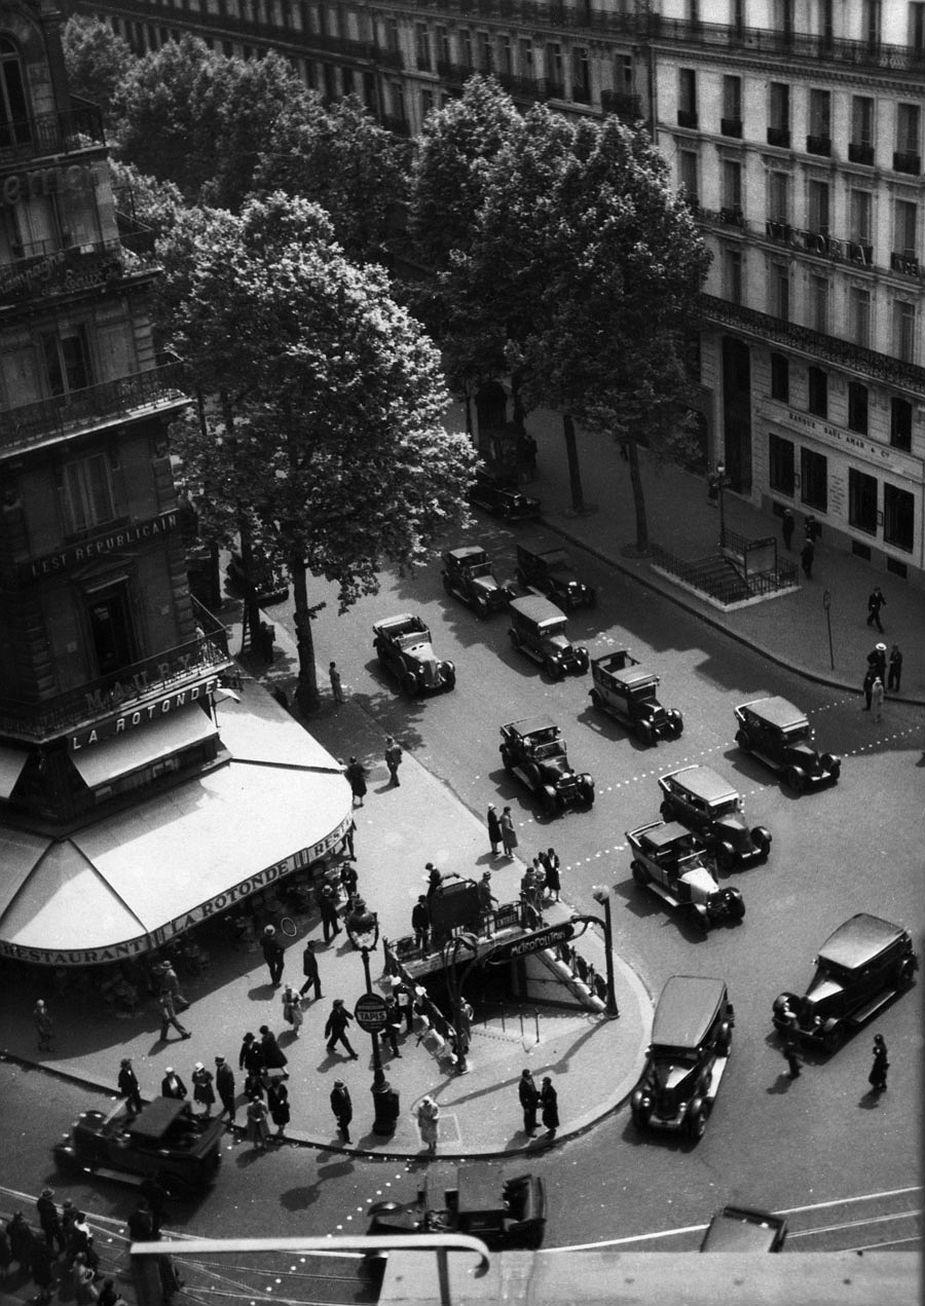 View from Galeries Lafayette Department Store onto Boulevard Haussmann, Paris, 1930 © Fritz Block